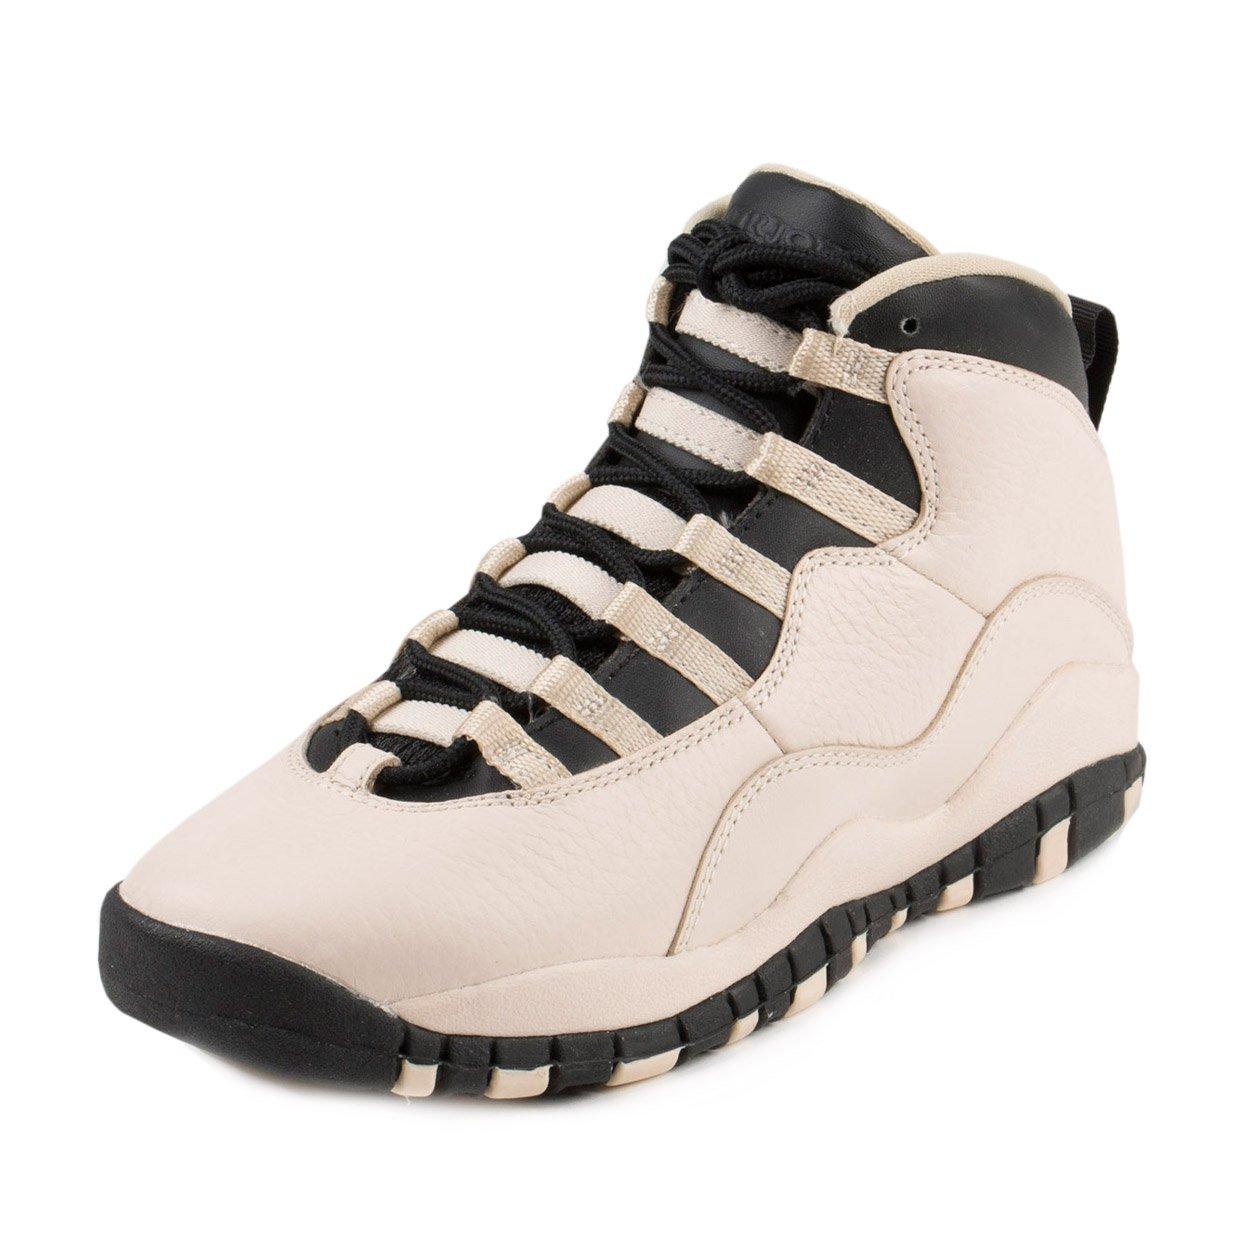 Jordan Nike Kids 10 Retro Prem GG Pearl White/Black/Black Basketball Shoe 6.5 Kids US by Jordan (Image #1)